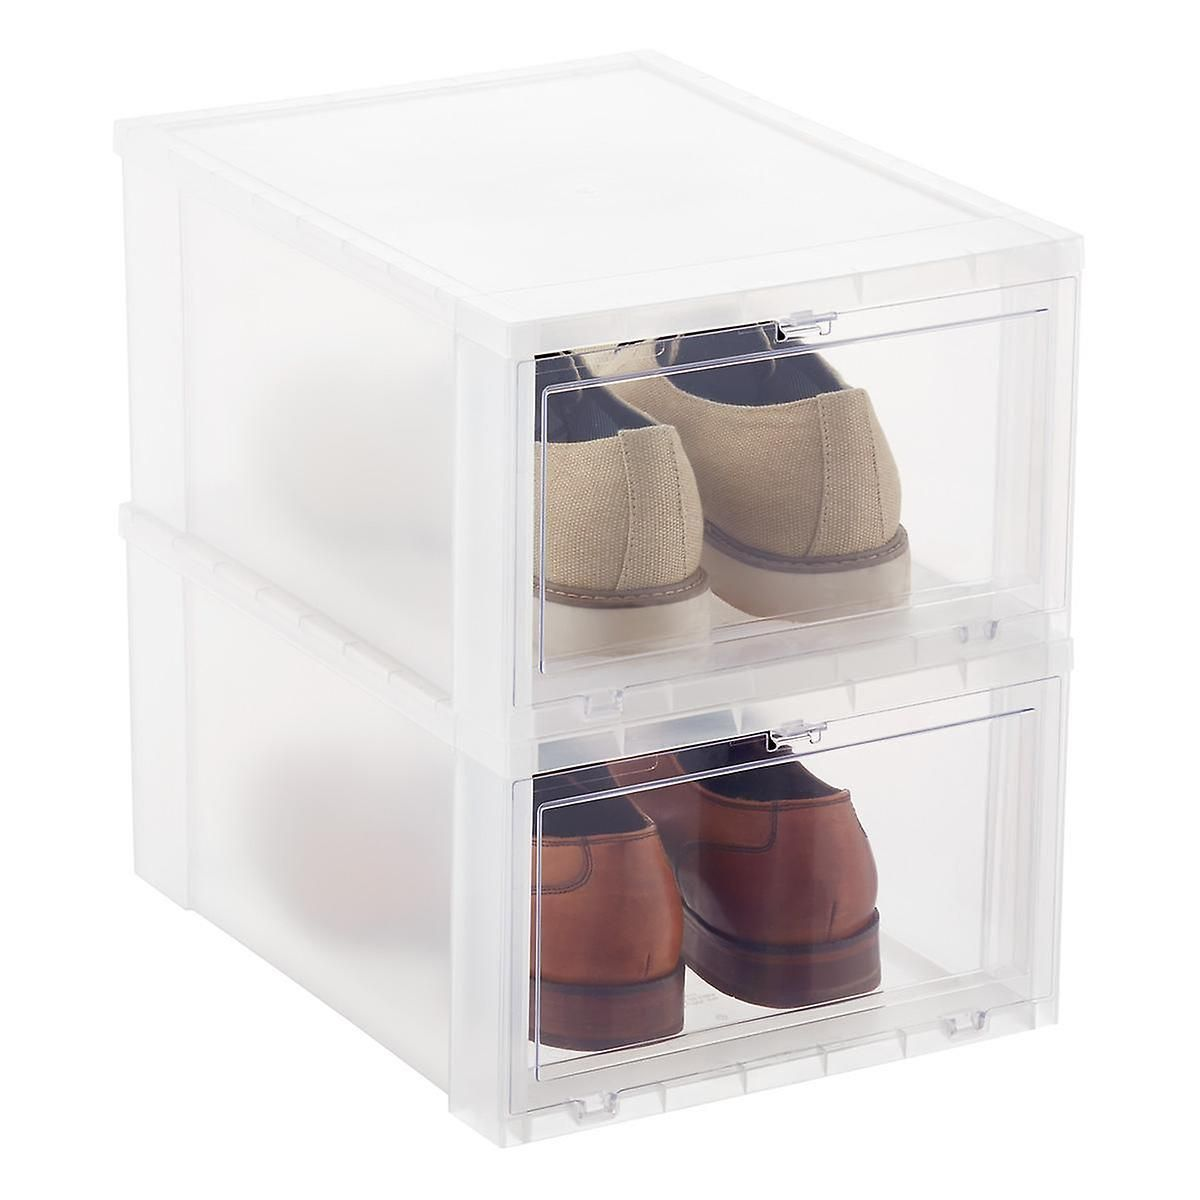 Large Drop Front Shoe Box Cool Stuff Drop Front Shoe Box Closet Shoe Storage Sneaker Storage